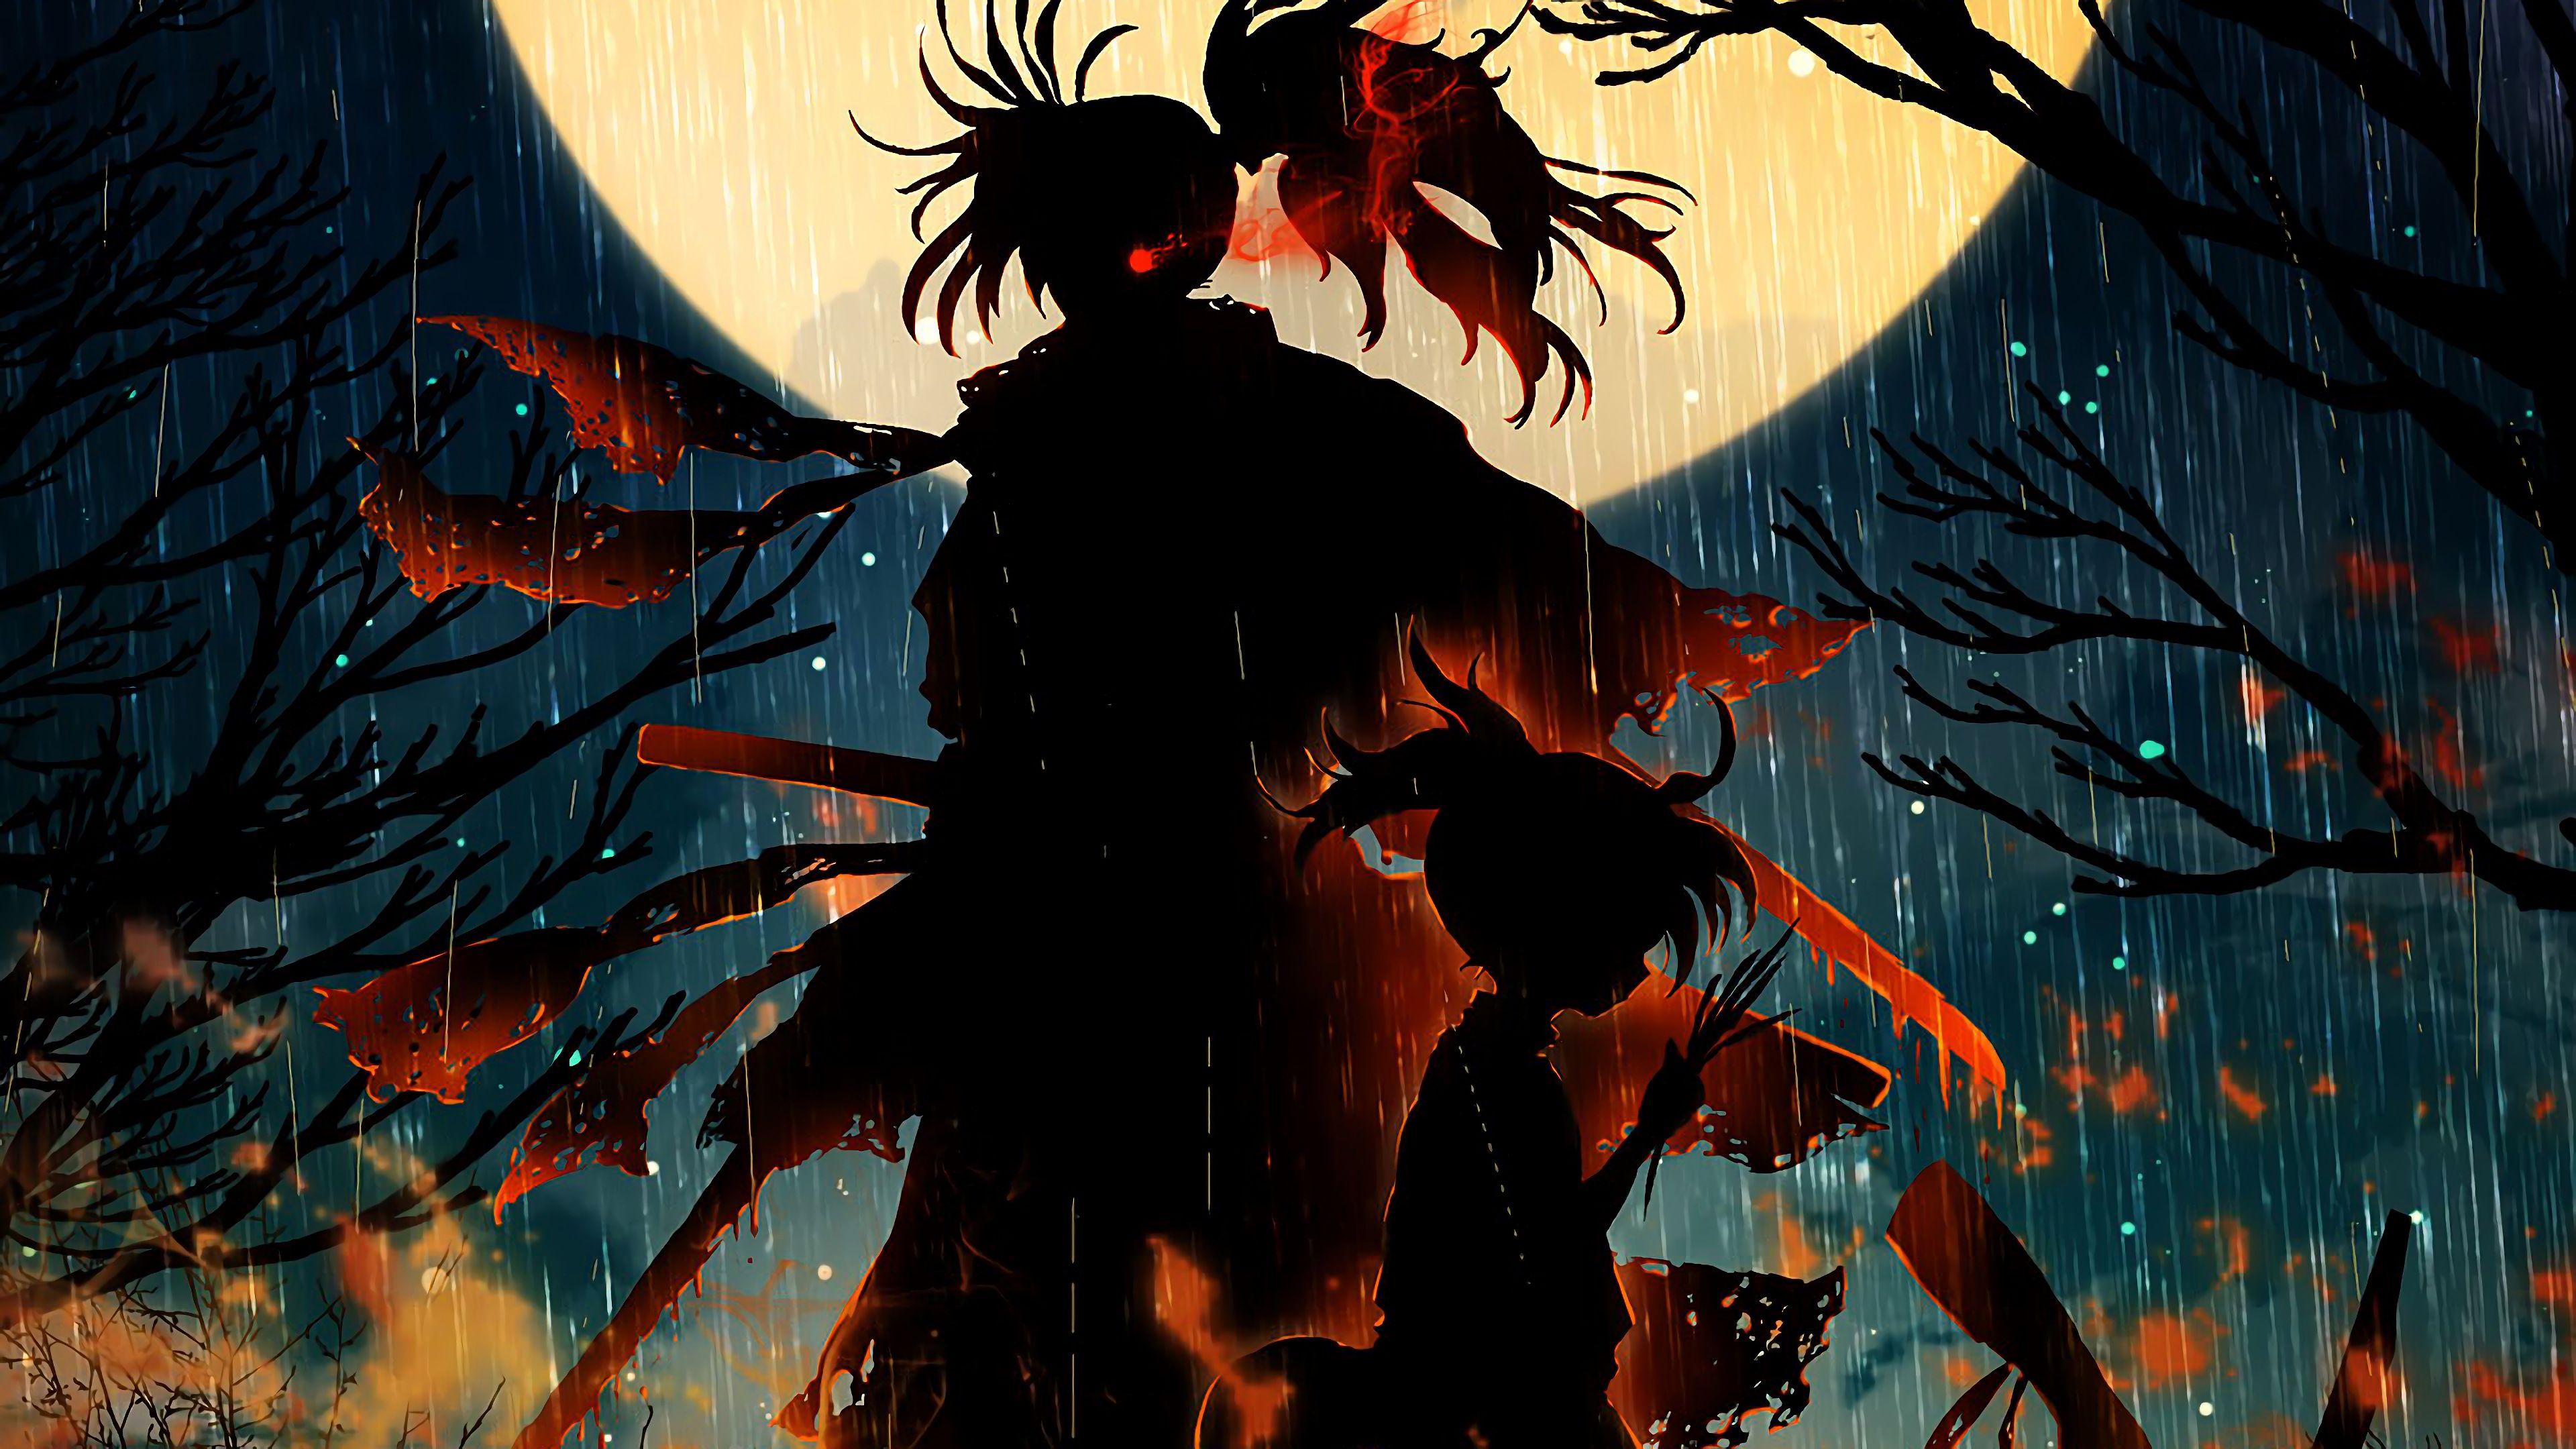 Dororo (Anime Series) HD Images Anime, Anime wallpaper